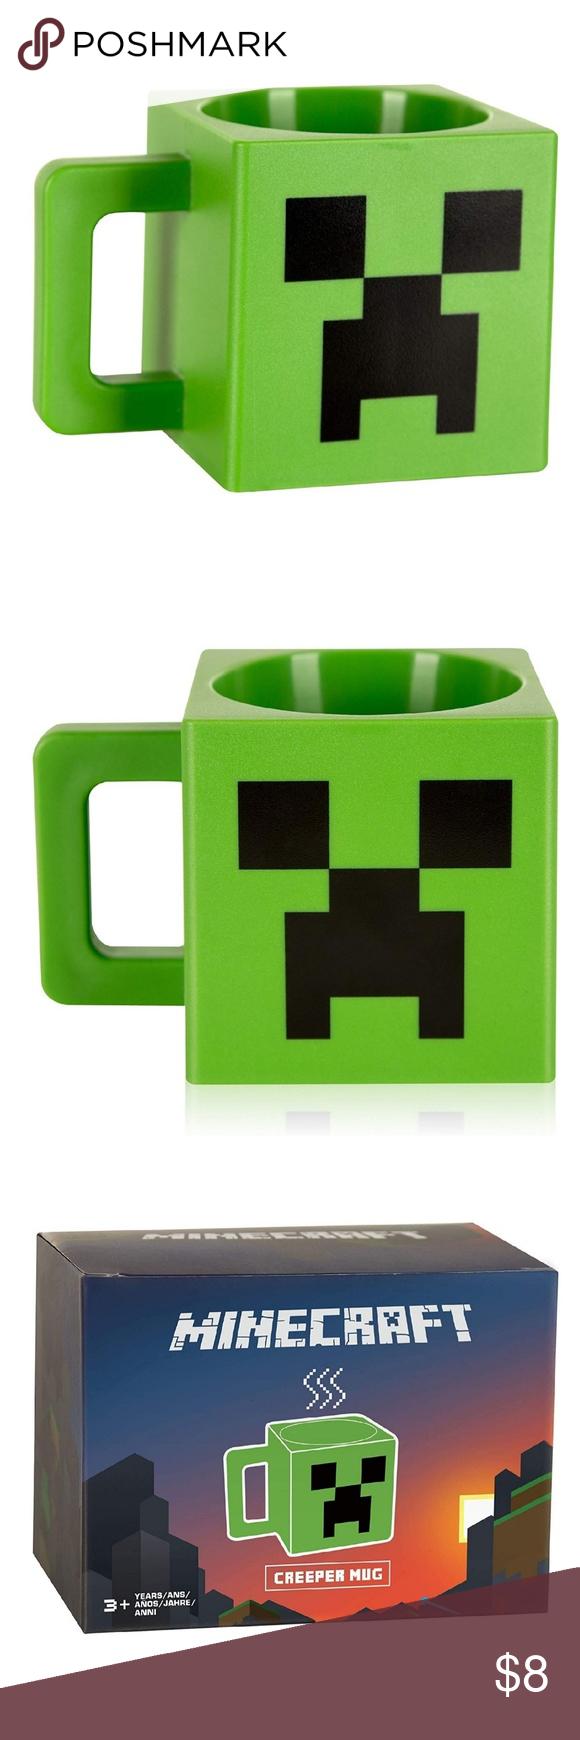 Minecraft Creeper Face Ceramic Mug 8 Ounces Plastic Mugs Mugs Minecraft